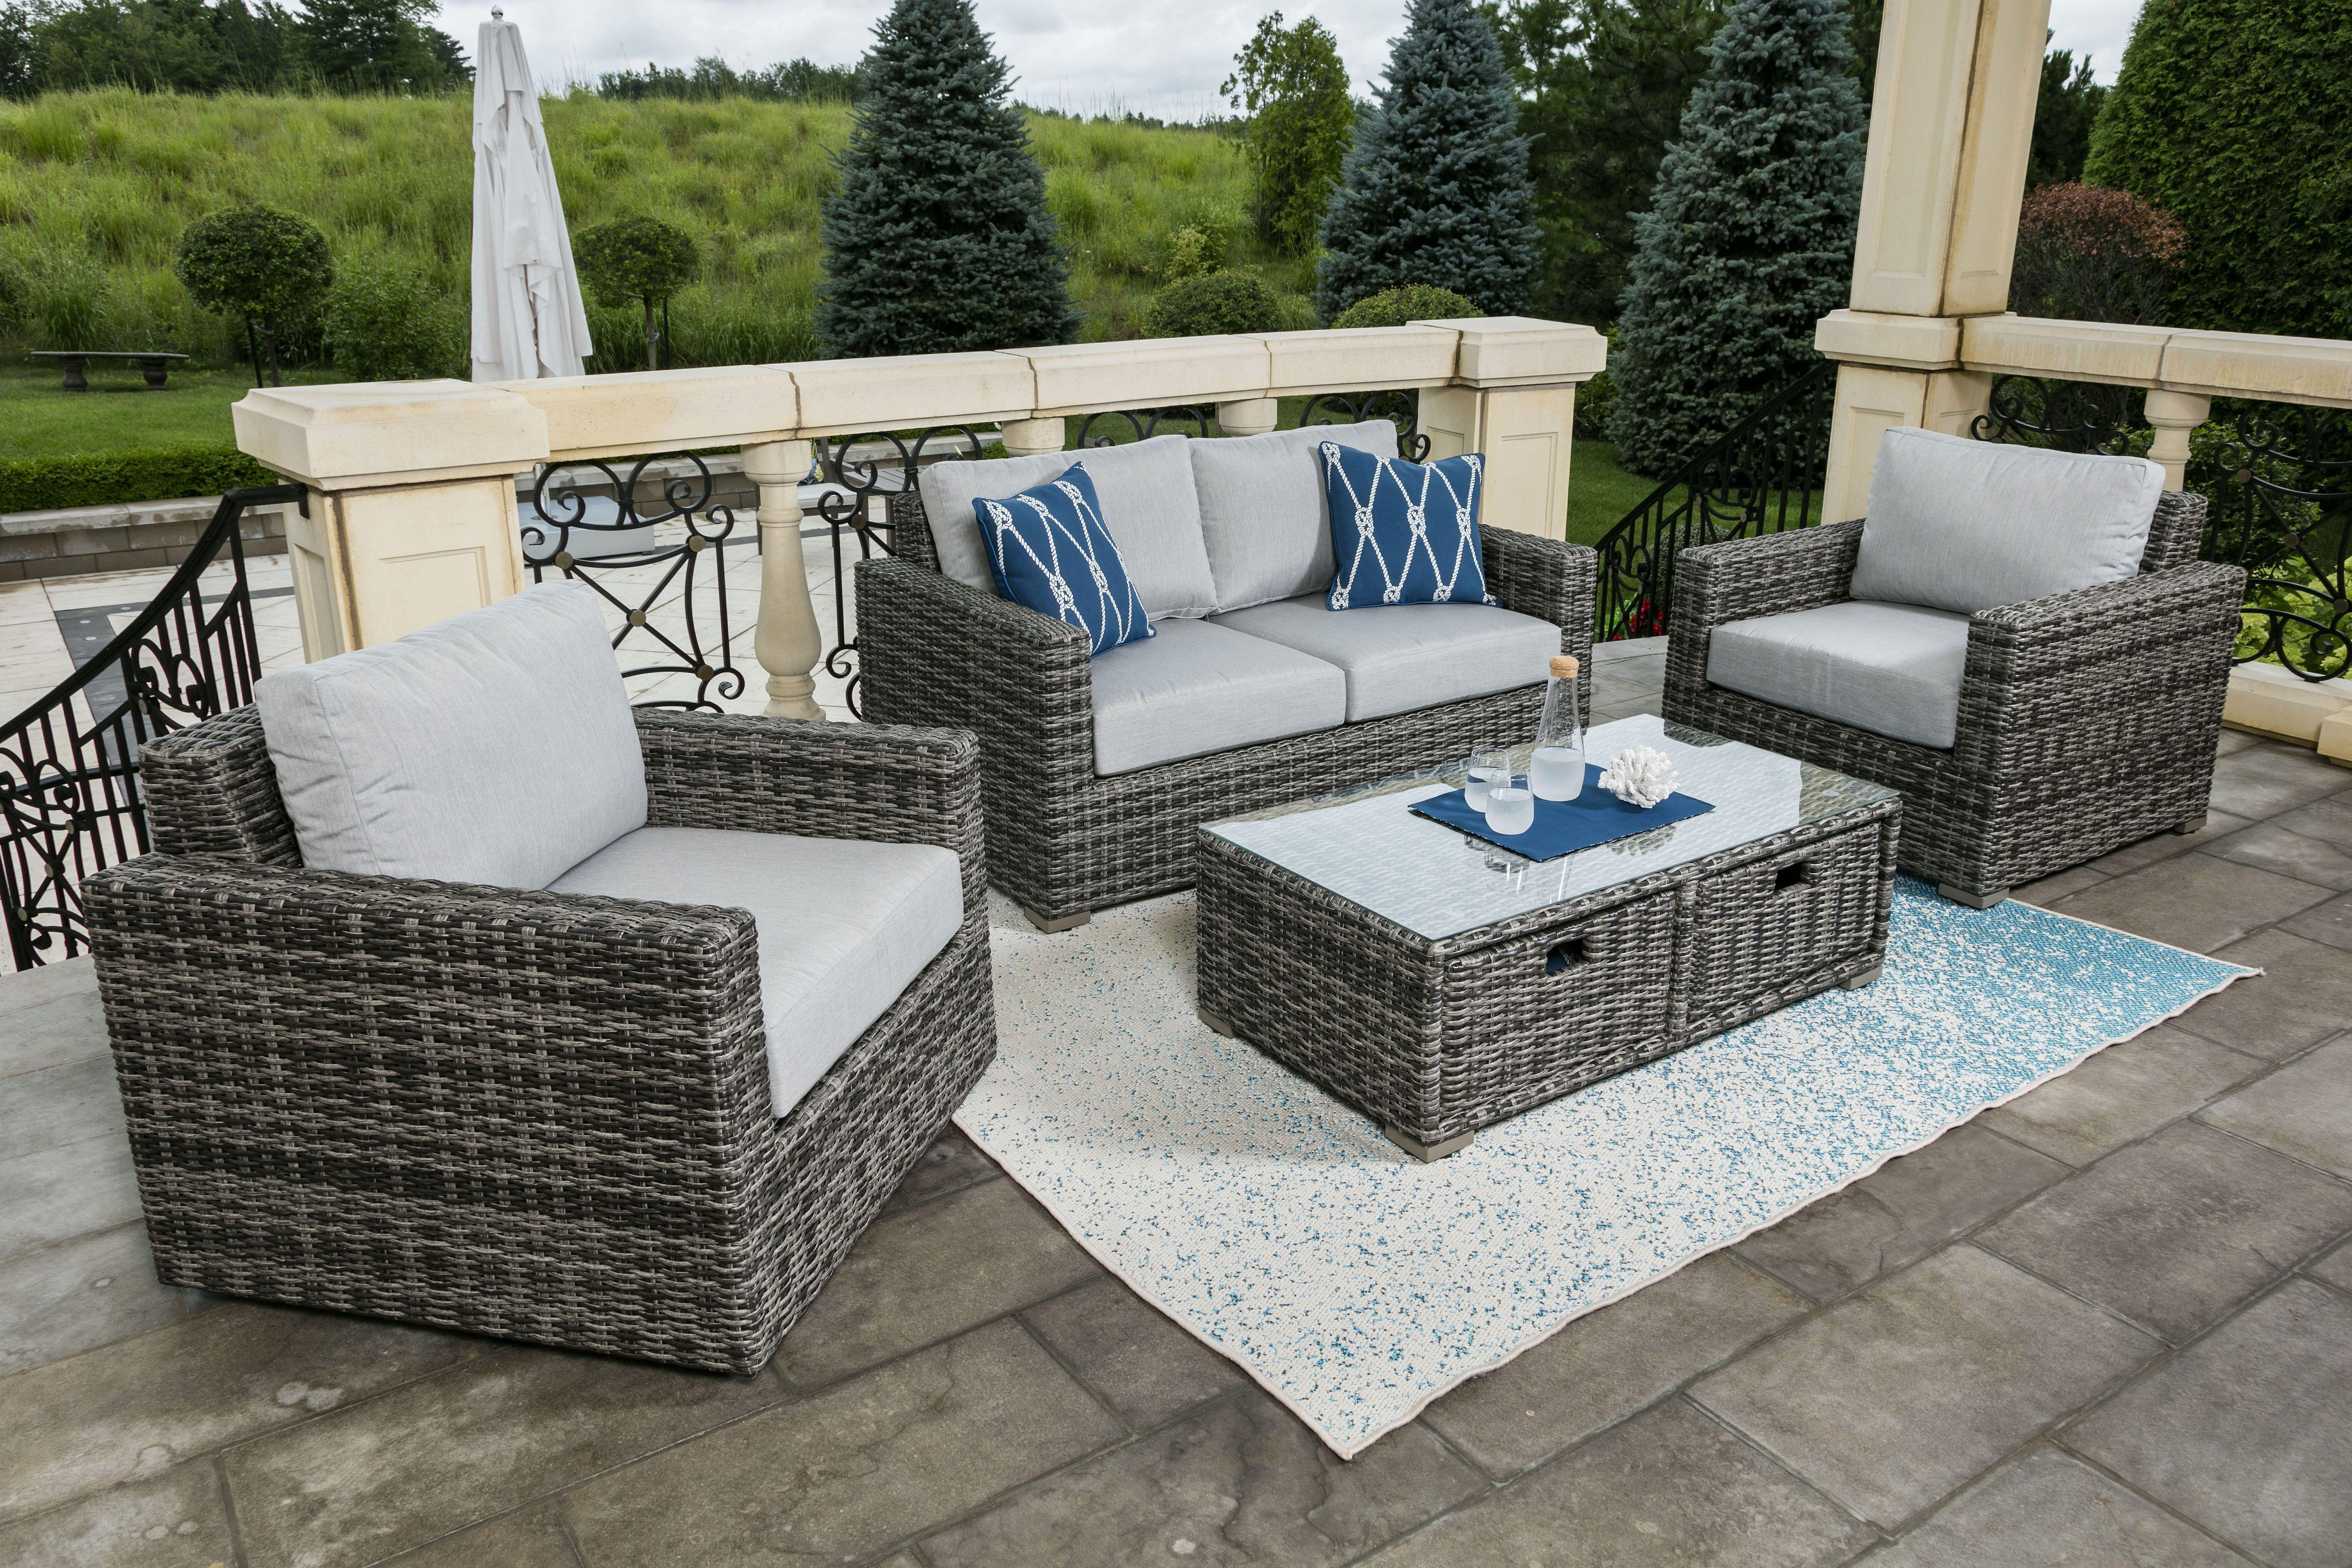 Salon Exterieur Victoria Luxury Patio Furniture Deep Seating Patio Furniture Collection